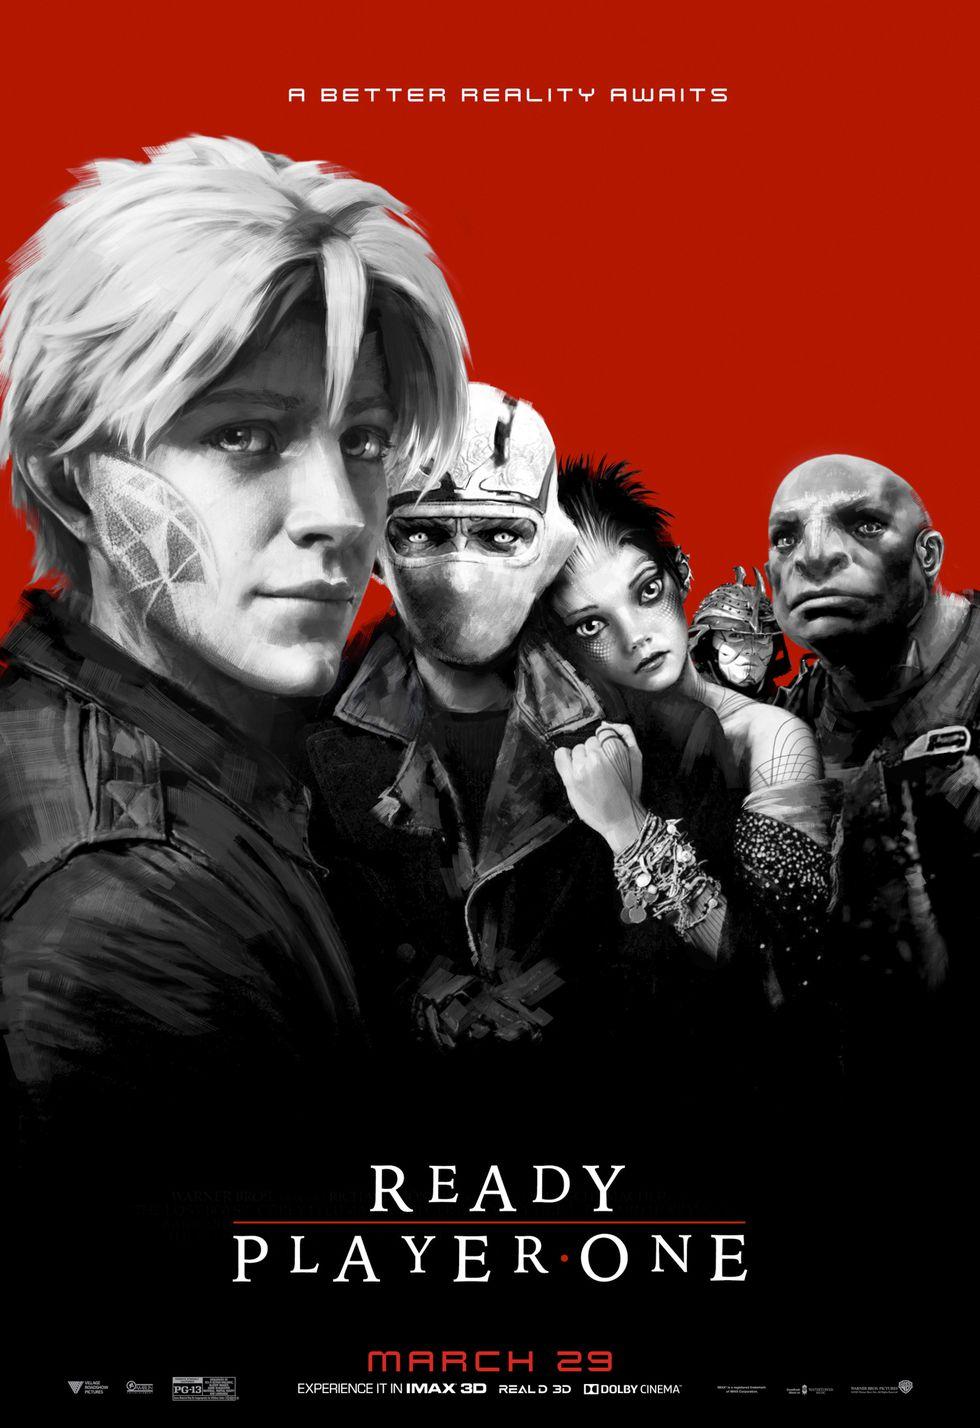 readyplayerone-tributeposter-highres-lostboys-1520373880.jpg